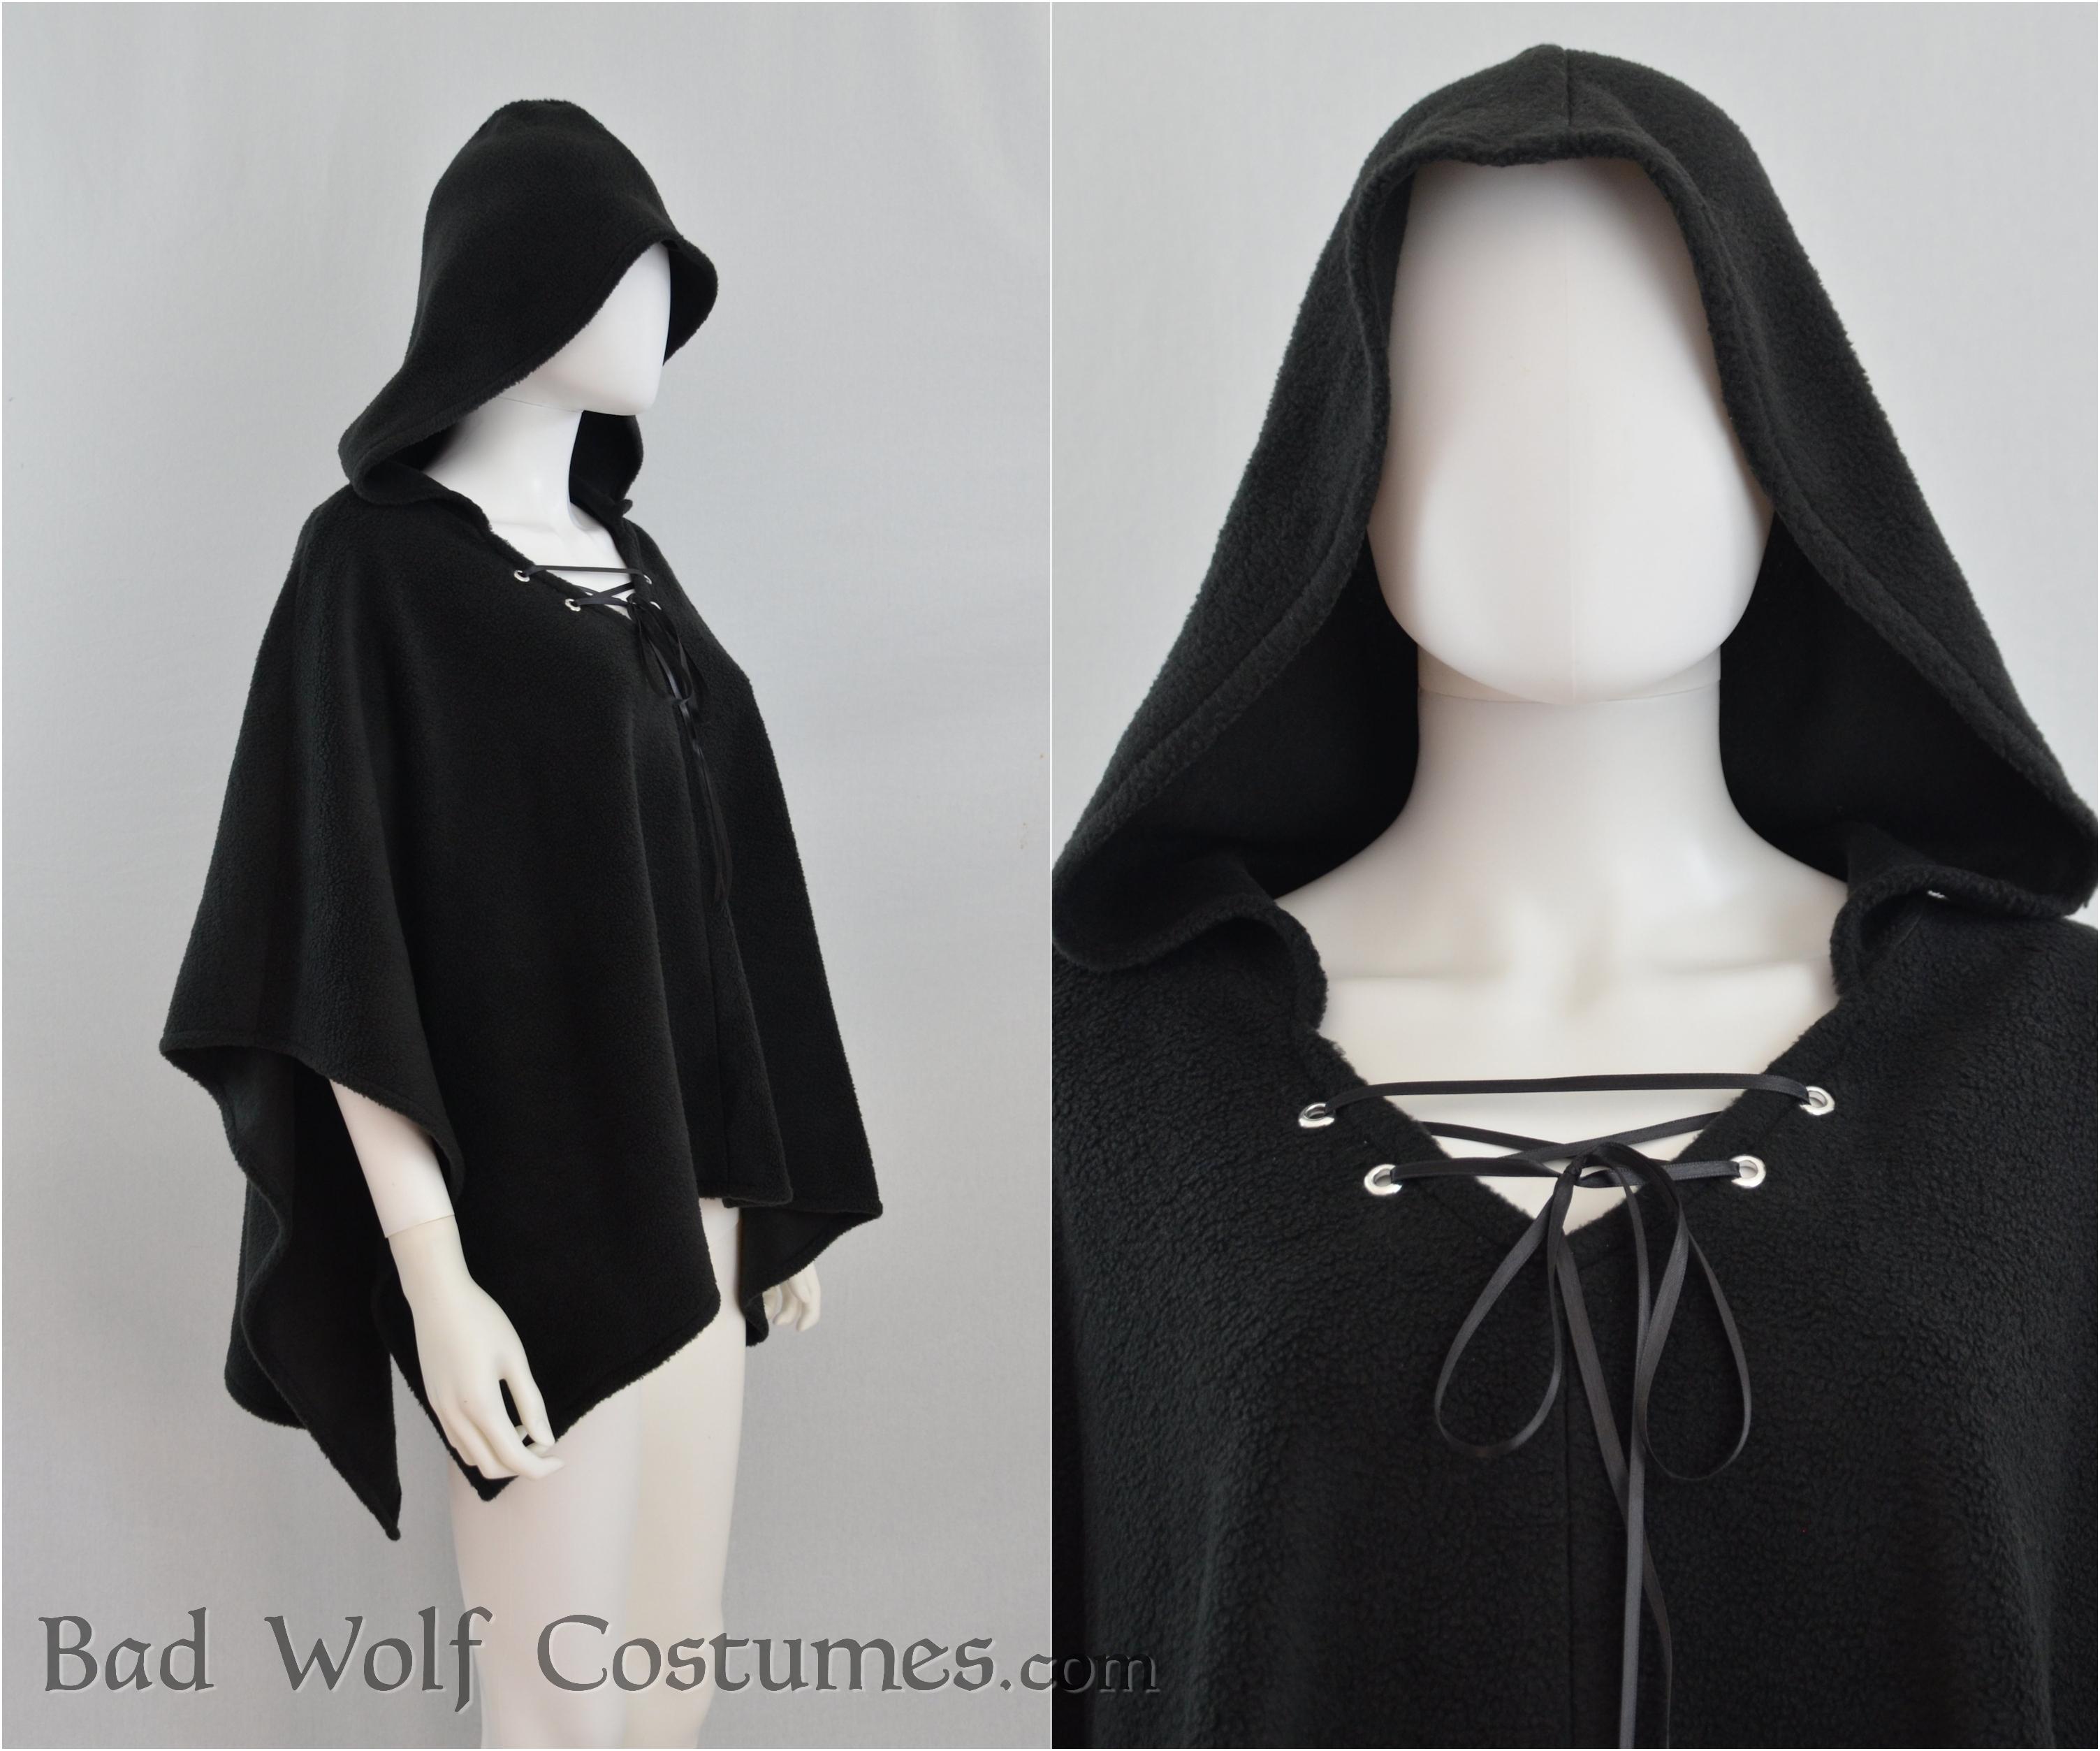 85ad07cbc2 Hooded Cloak - Color Options! - Fleece Cape Poncho - Fantasy